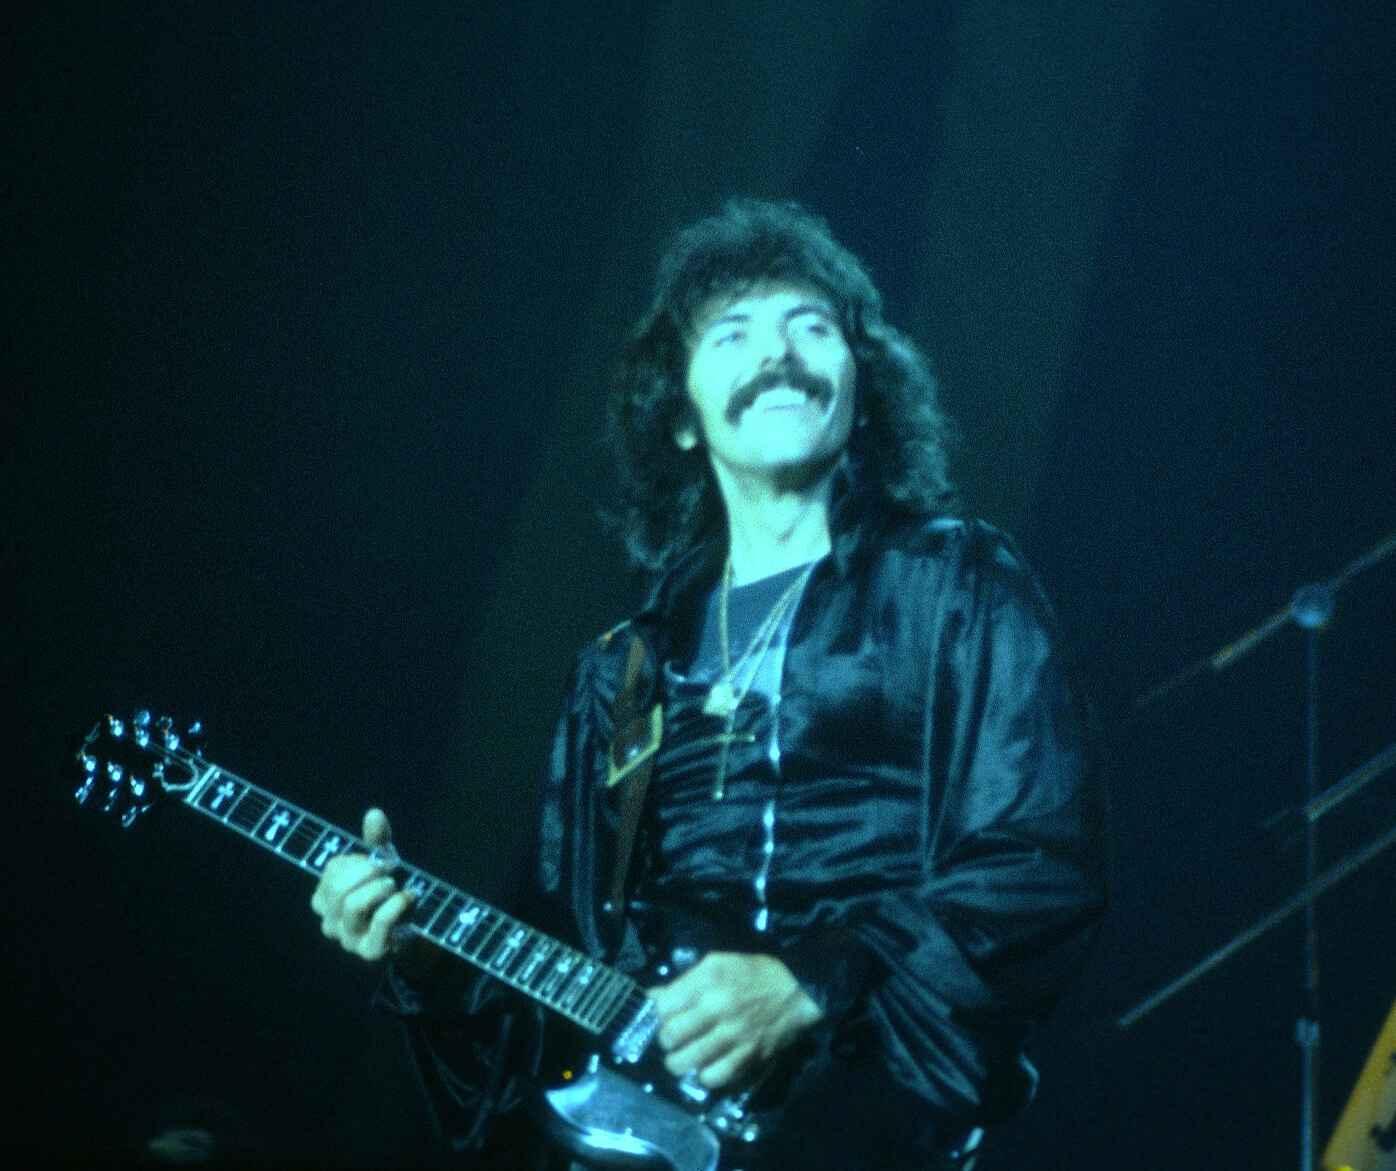 Tony Iommi en una imatge d'arxiu   Wikimedia Commons